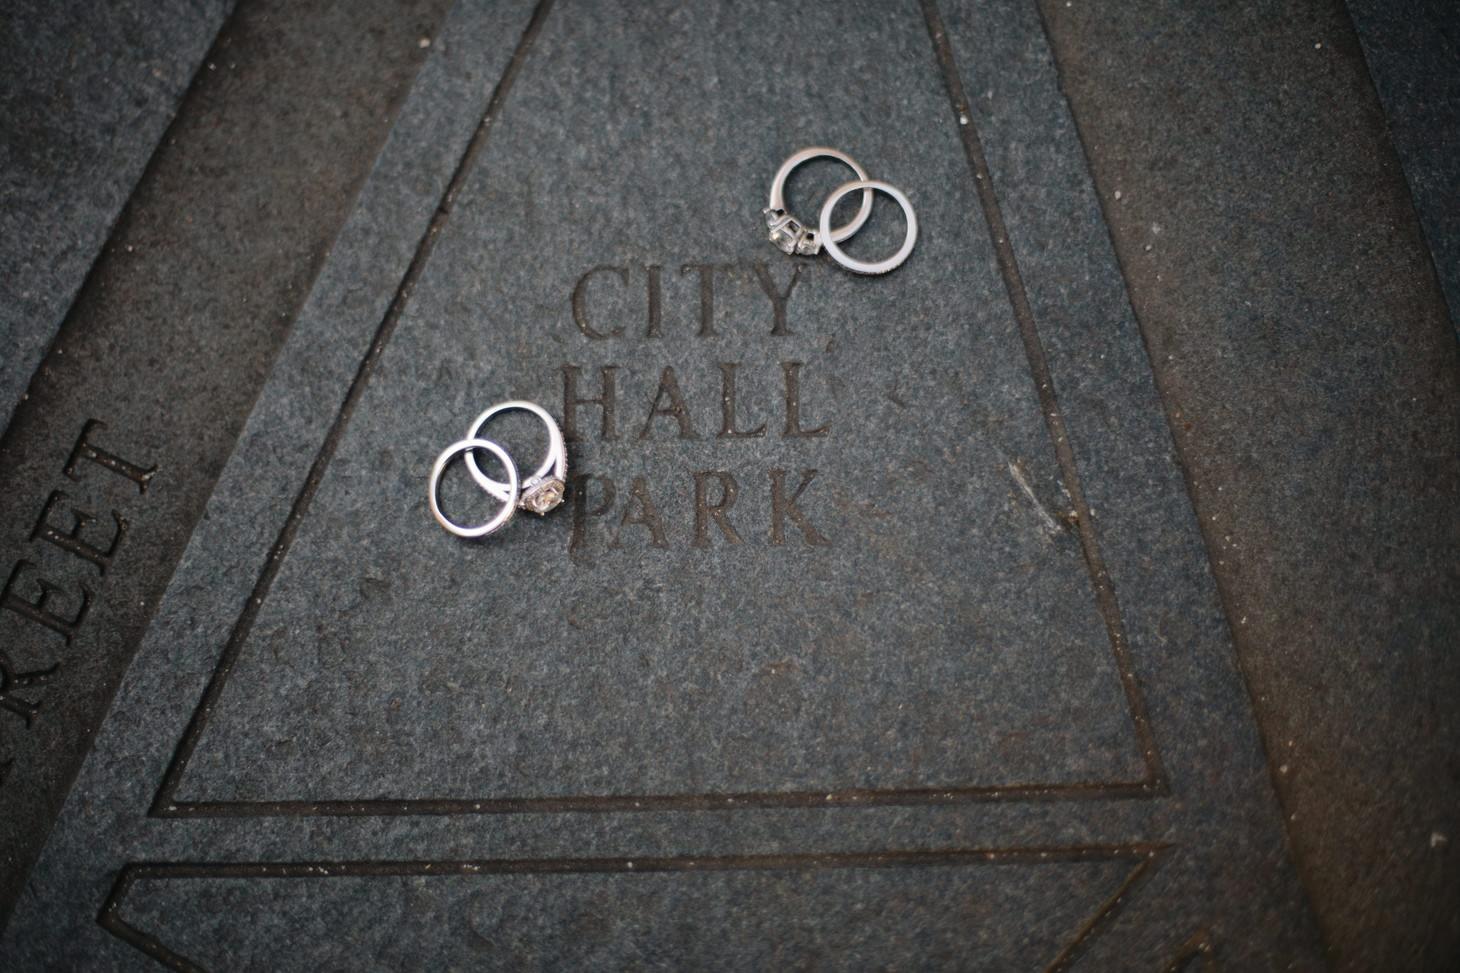 012-nyc-wedding-elopement-lgbt-friendly-photographer-city-hall-grand-central.jpg